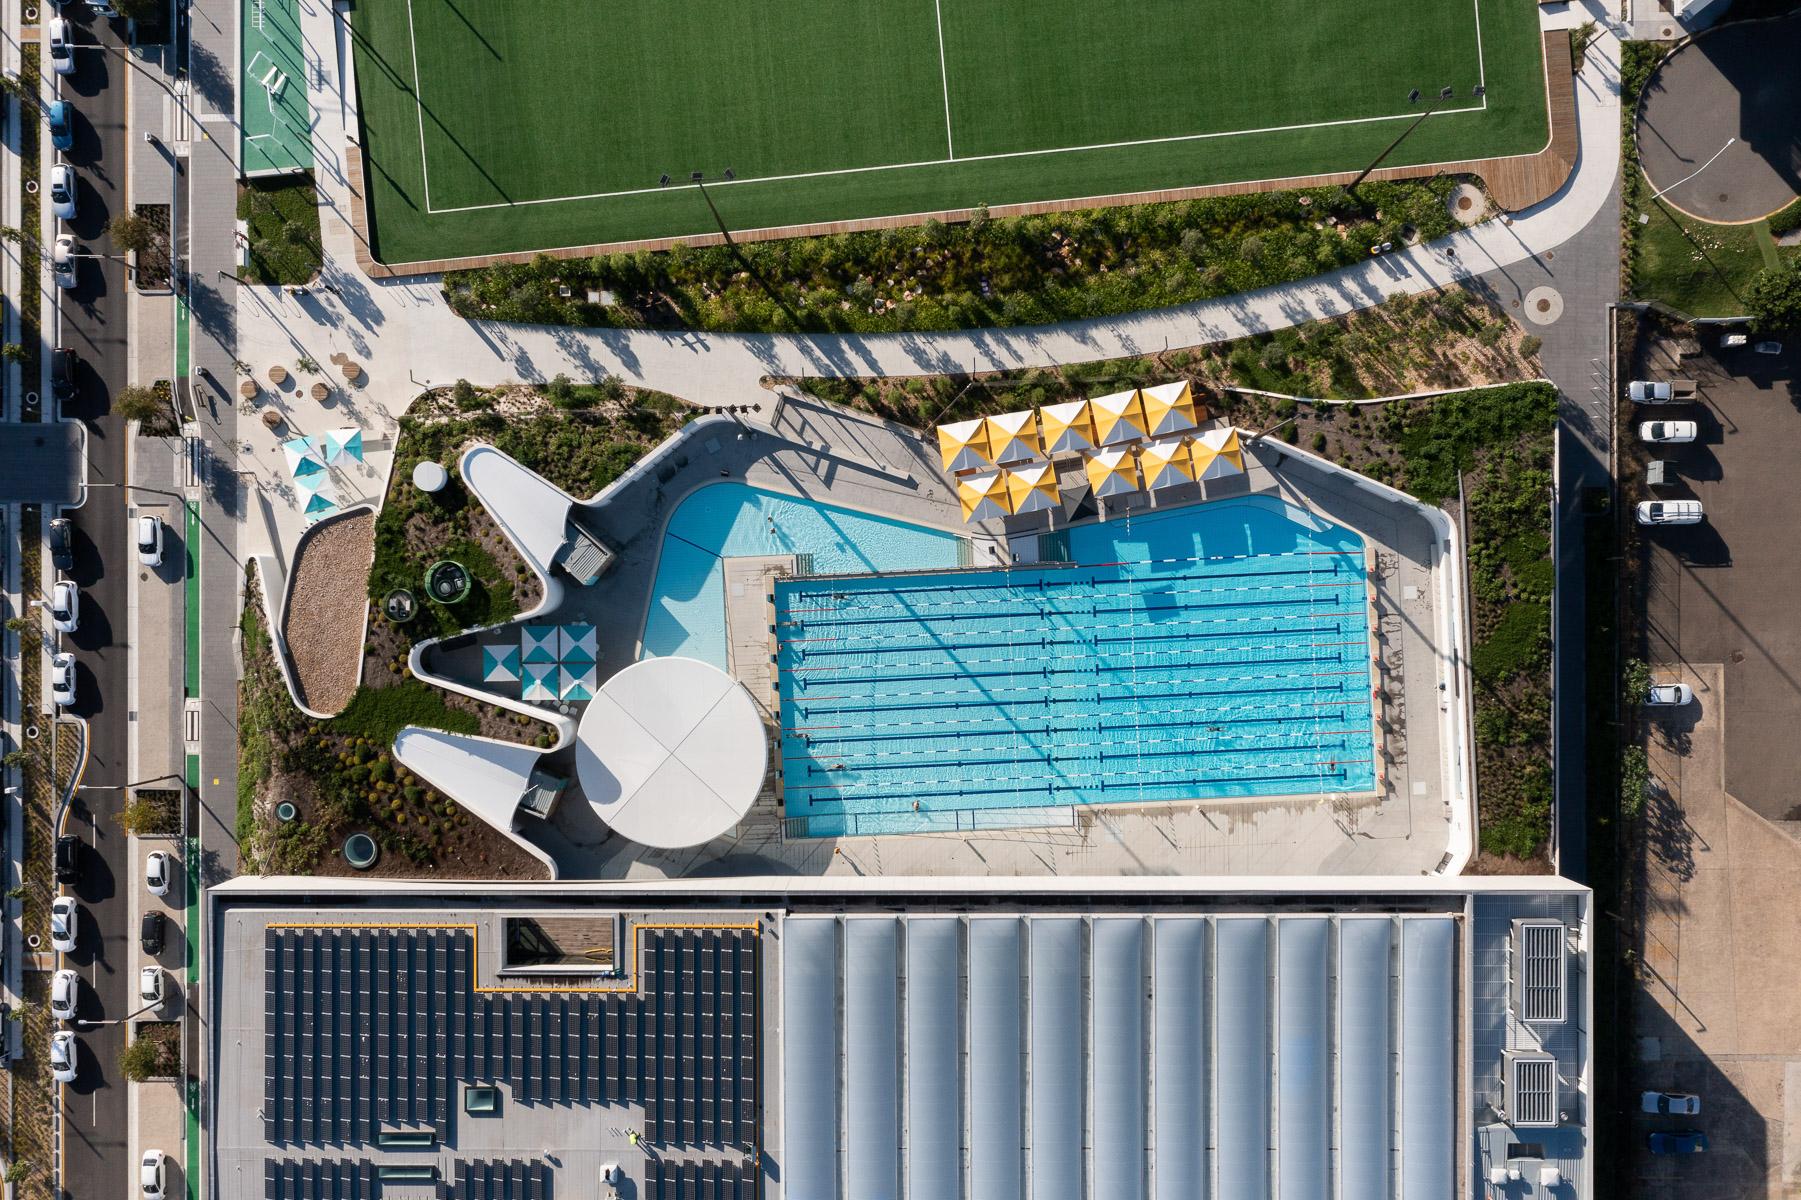 Gunyama Park Aquatic and Recreation Centre